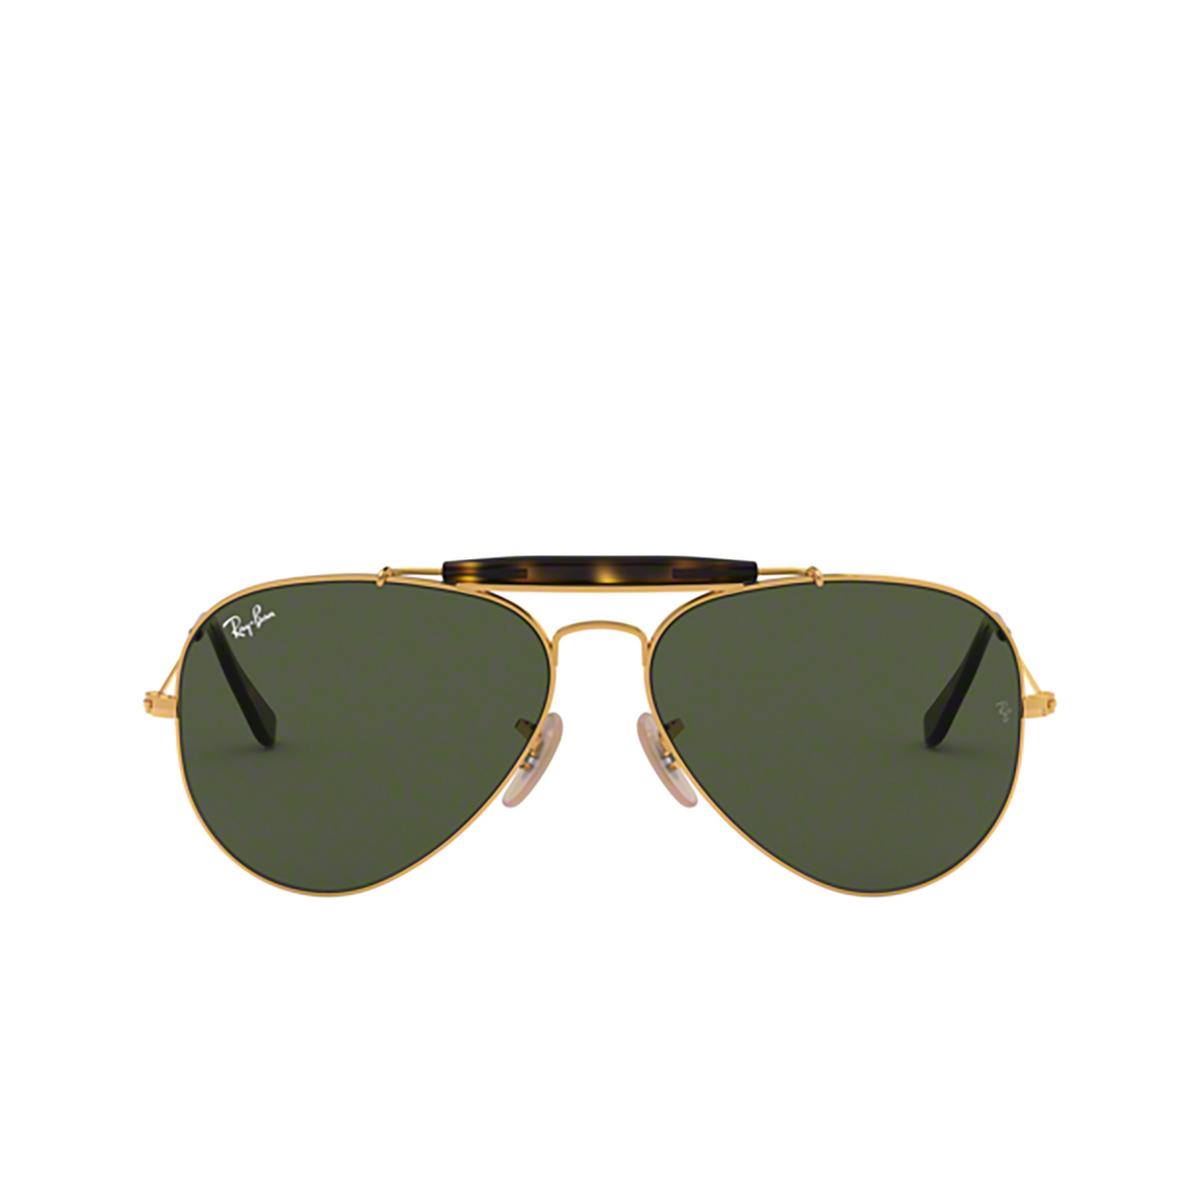 Ray-Ban® Aviator Sunglasses: Outdoorsman Ii RB3029 color Arista 181 - 1/3.